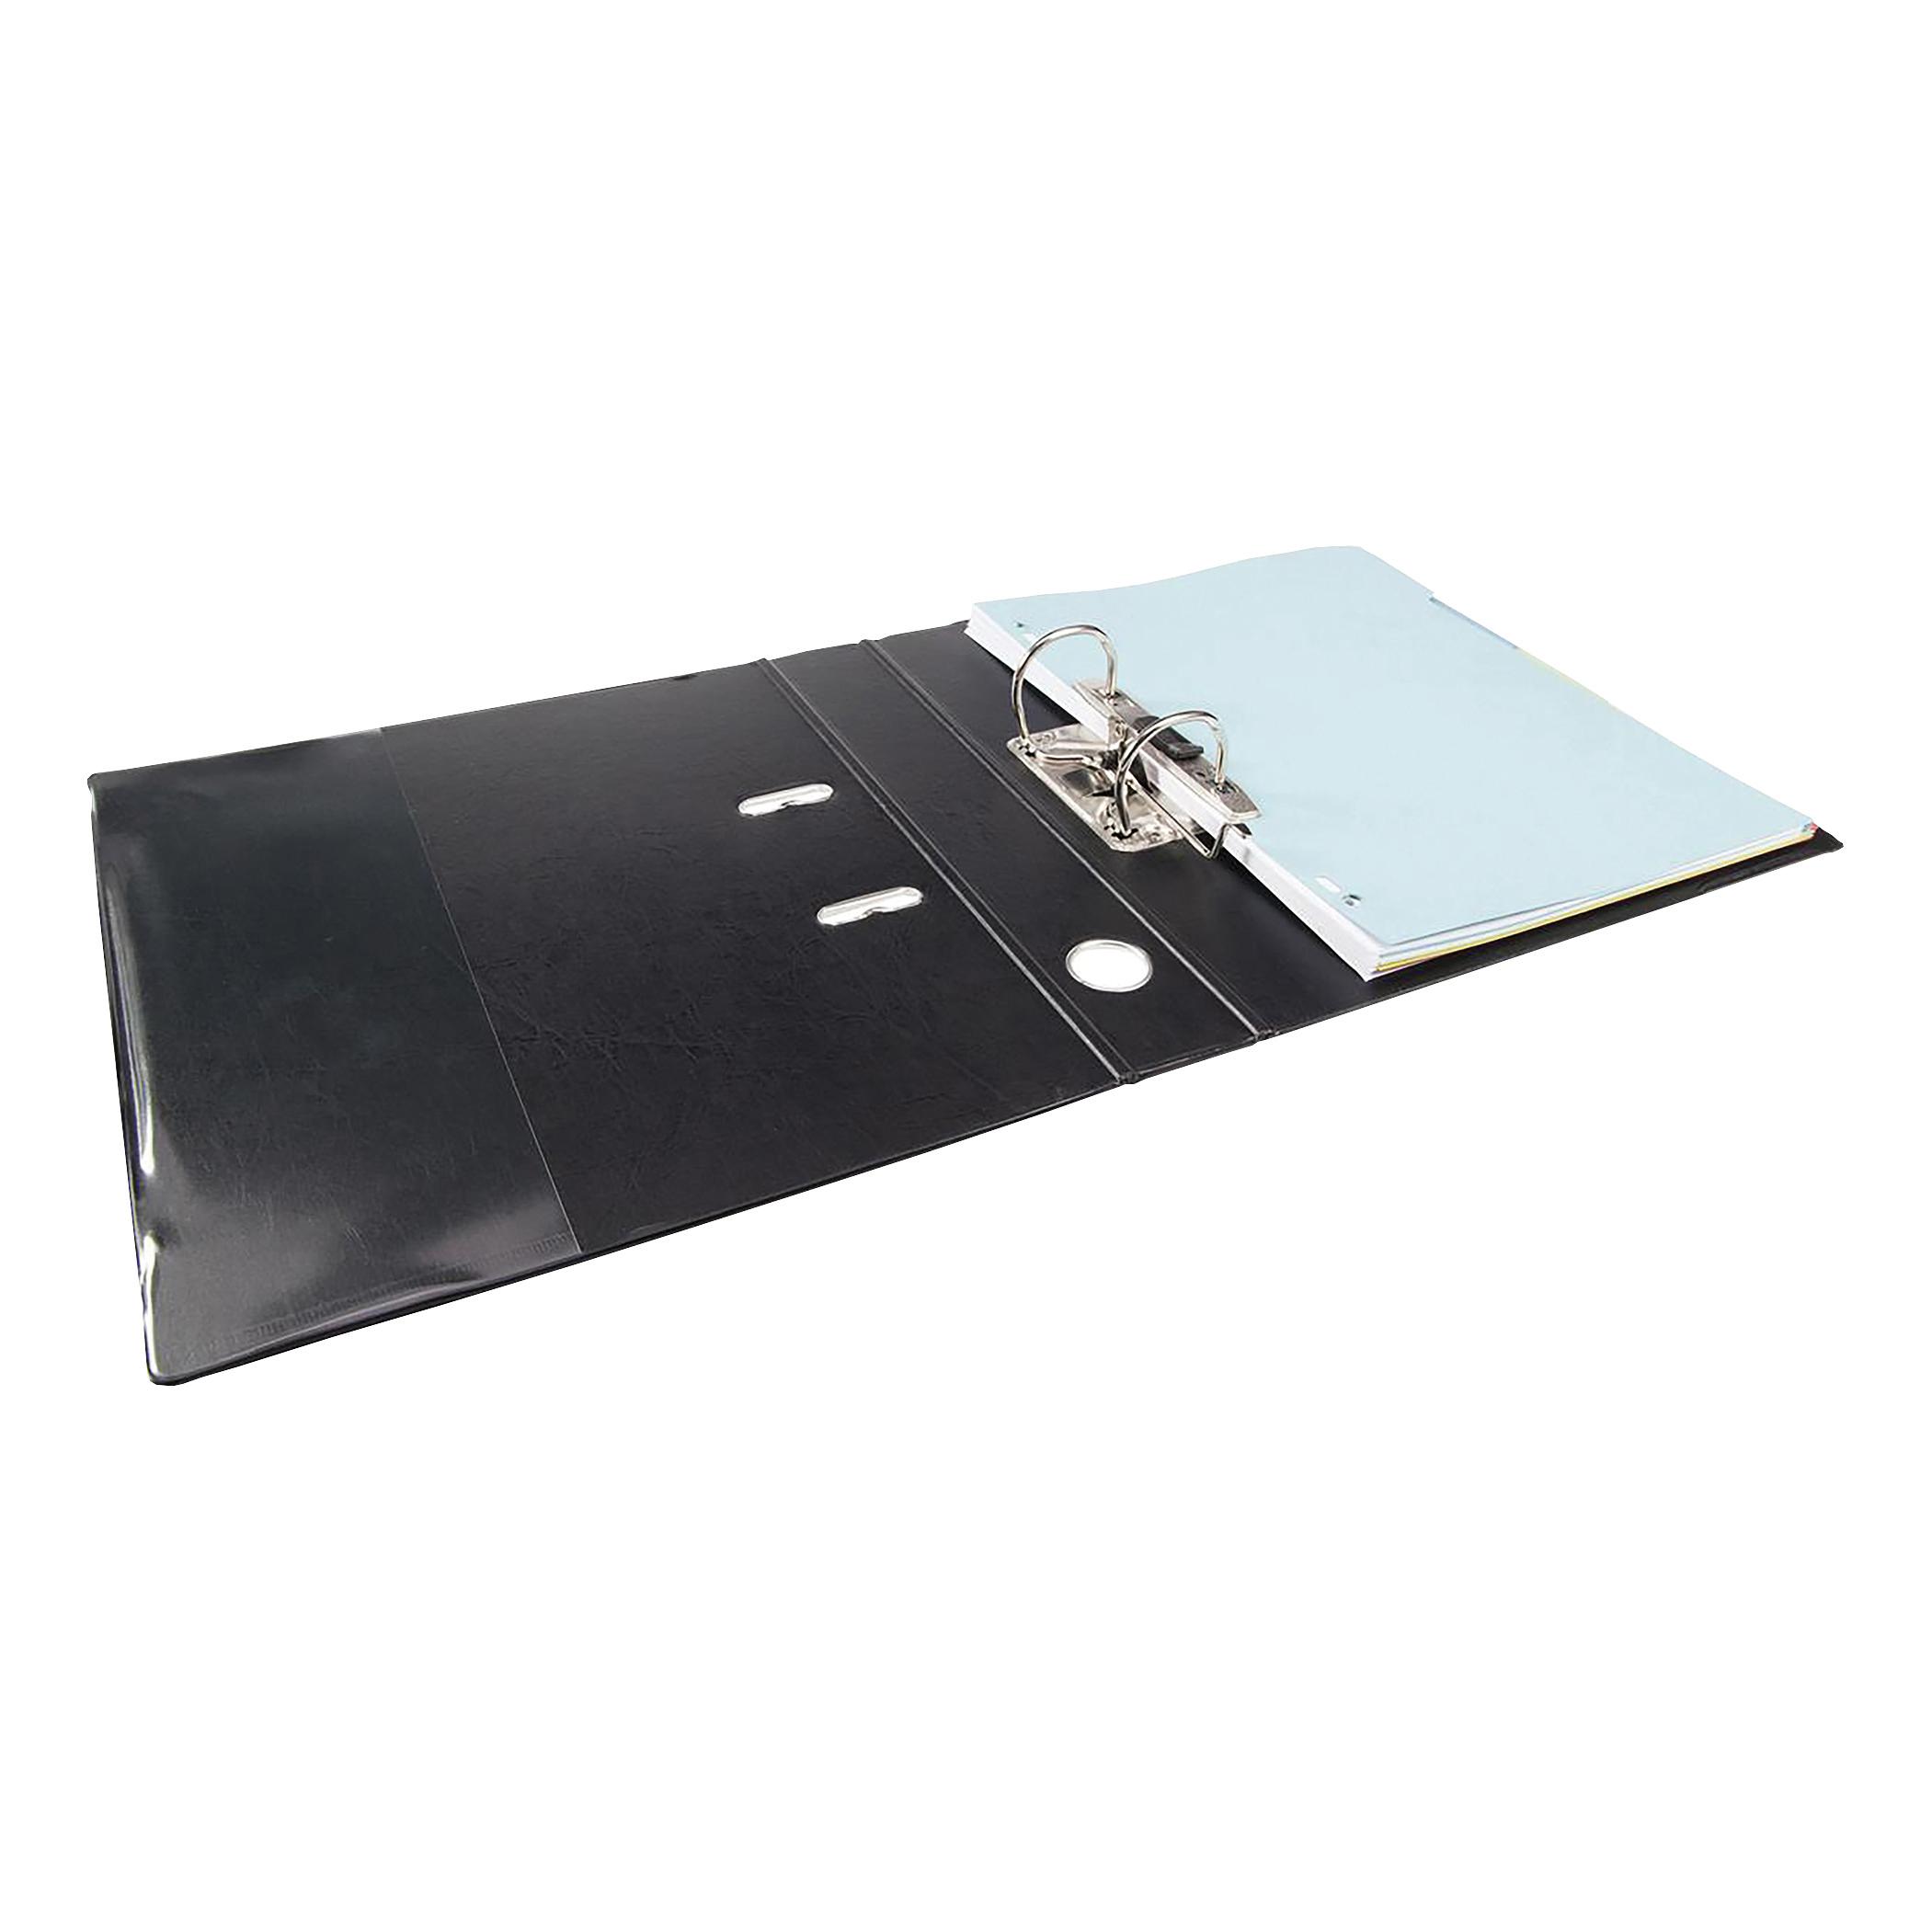 Elba Mini Lever Arch File Polypropylene 50mm Spine A4 Black Ref 100202102 [Pack 10]